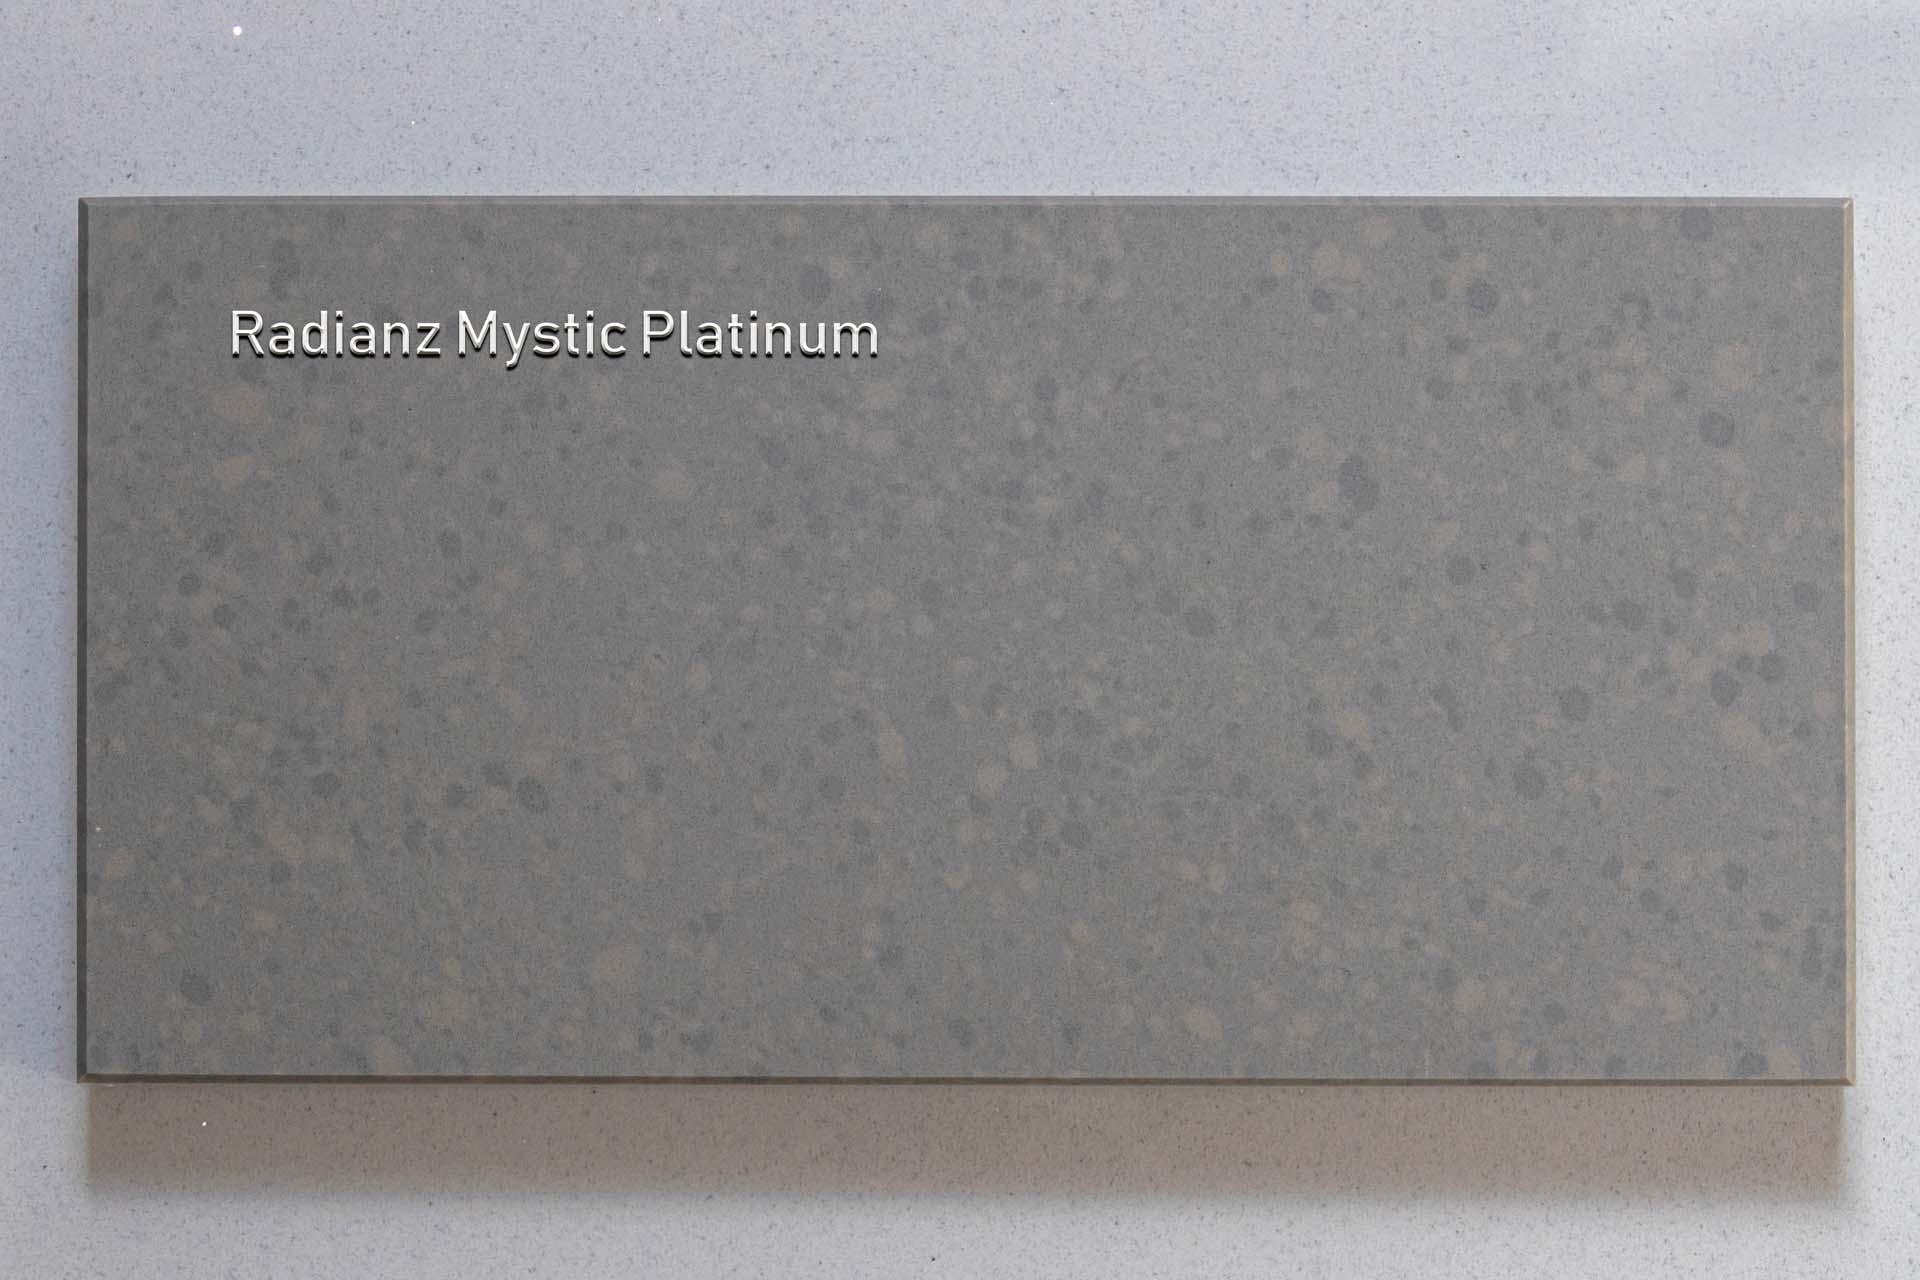 radianz mystic platinum small sparkly quartz worktops subtle special offer july 2019 165425